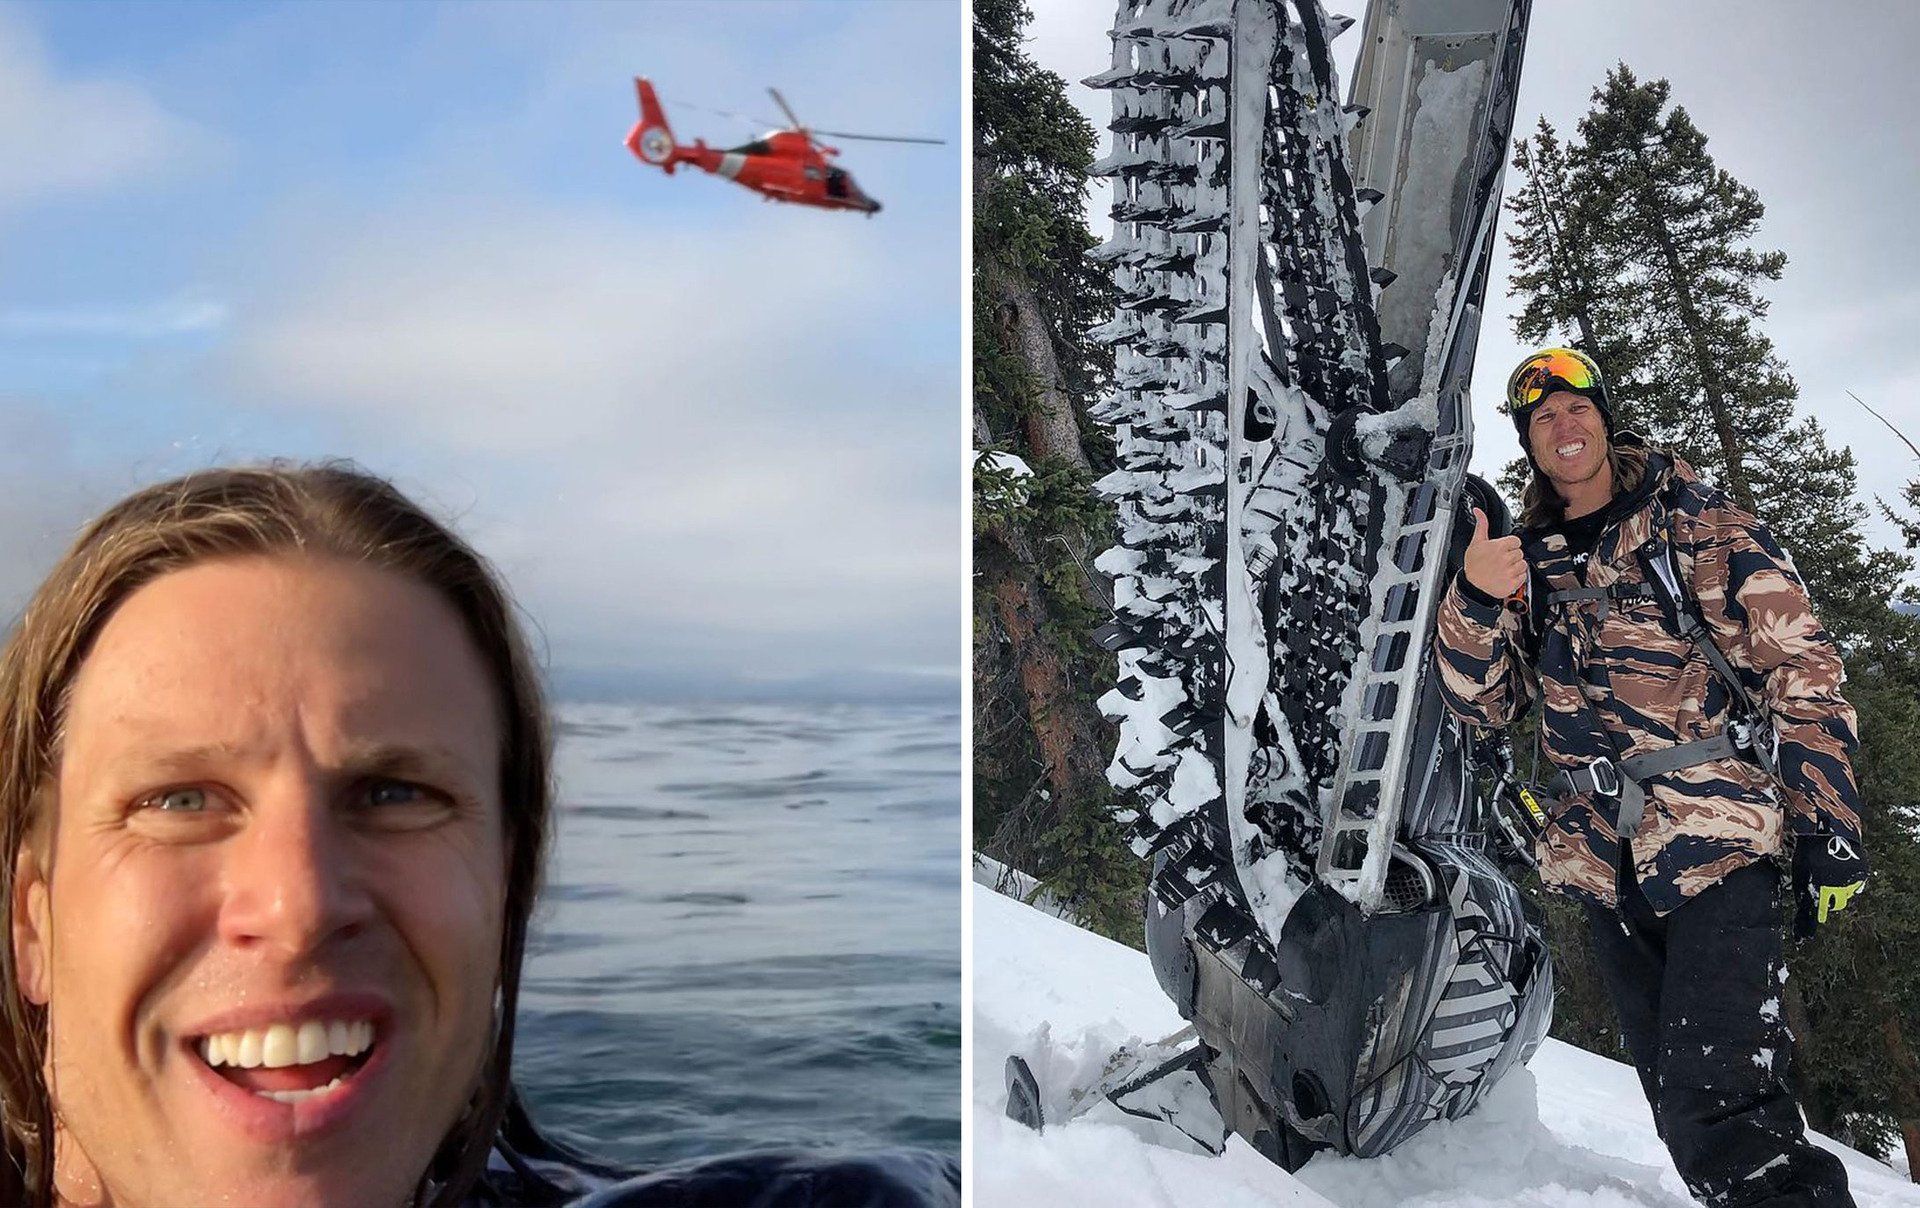 Daredevil selfie pilot denies crash was a stunt, blames fuel